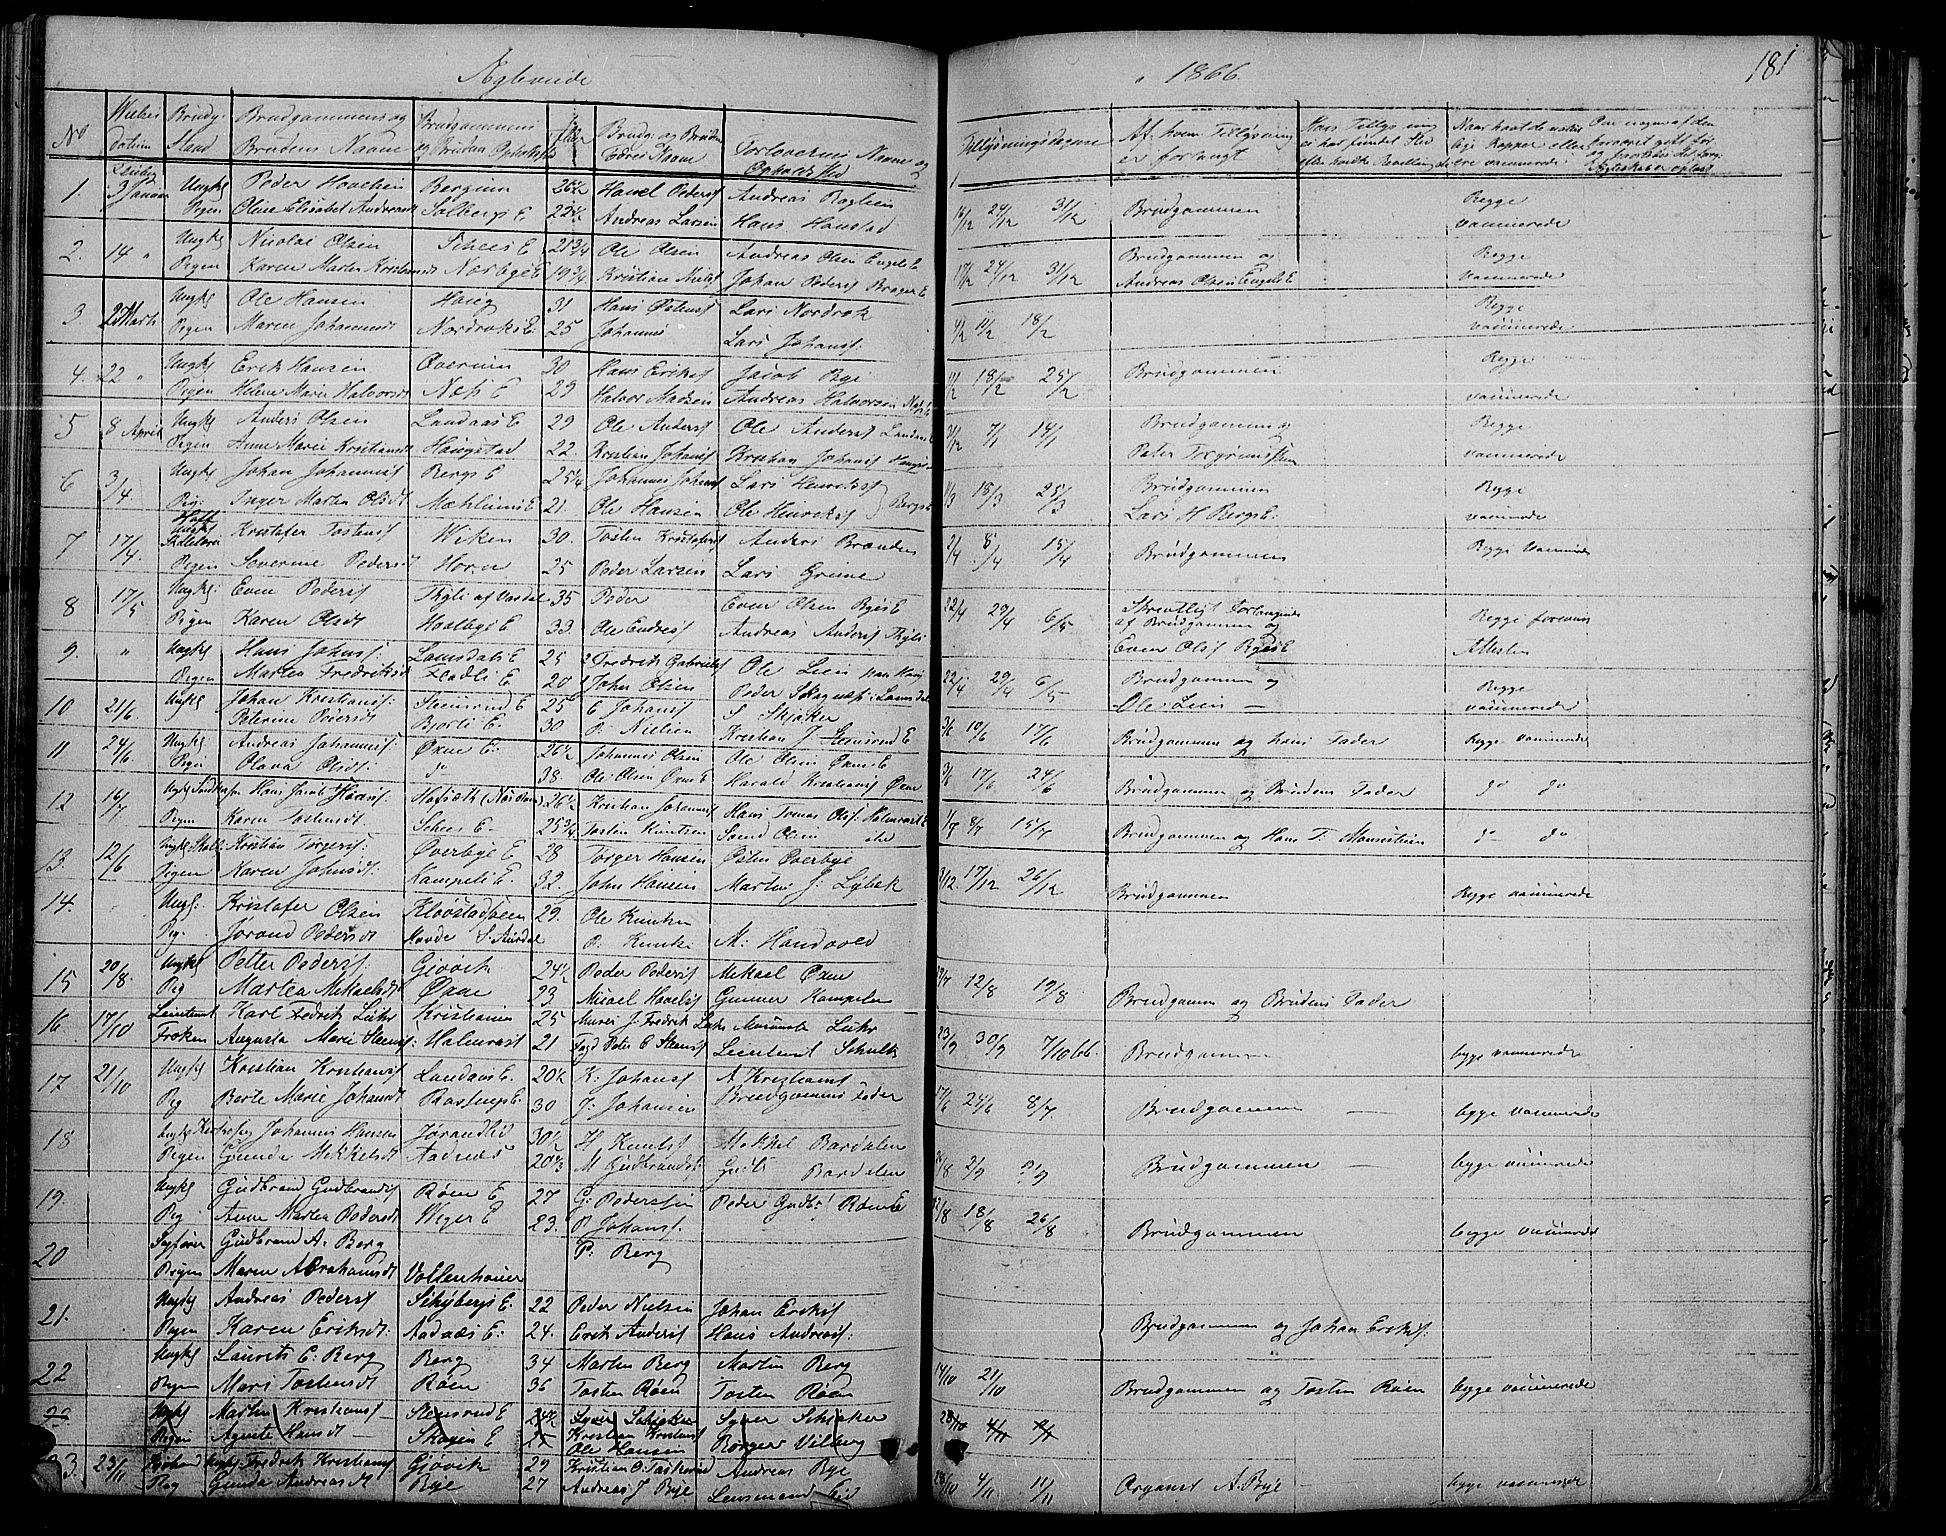 SAH, Søndre Land prestekontor, L/L0001: Klokkerbok nr. 1, 1849-1883, s. 181